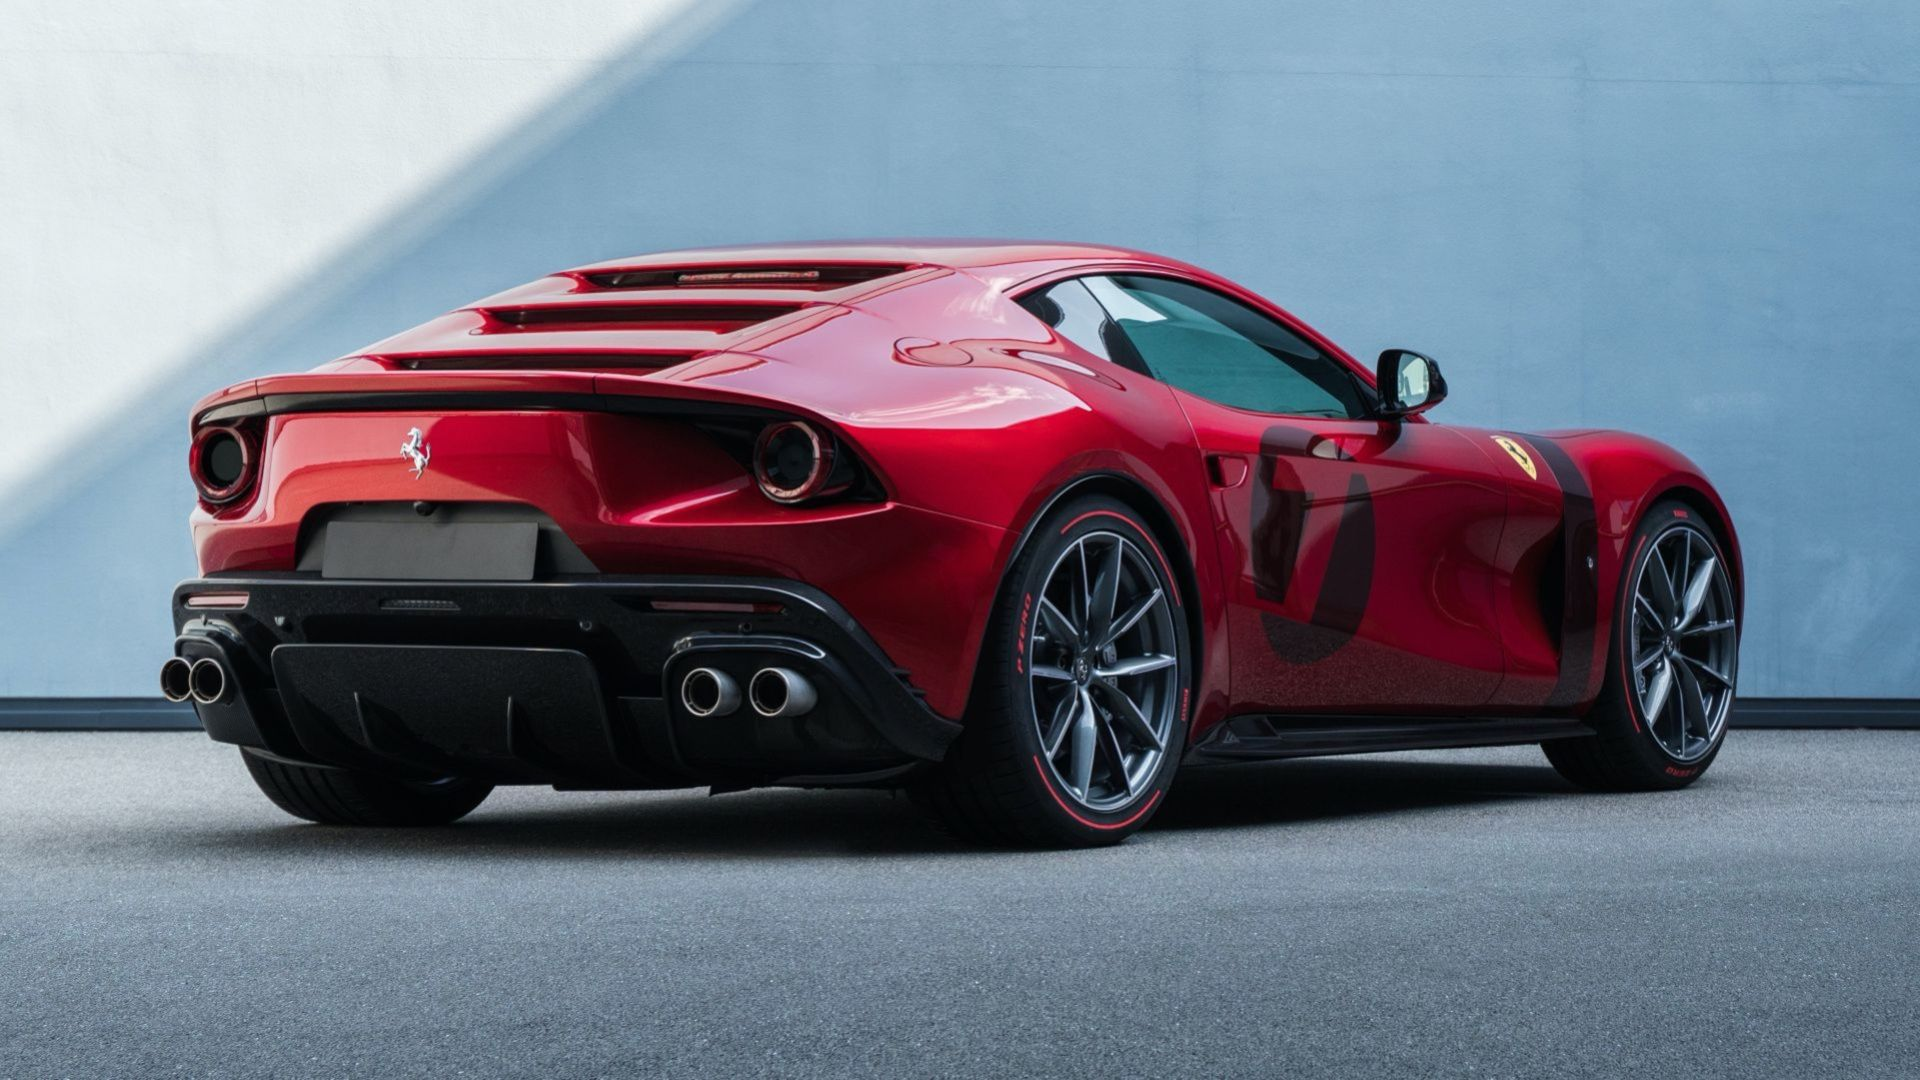 Ferrari Omologata - specialbygge baserat på 812 Superfast